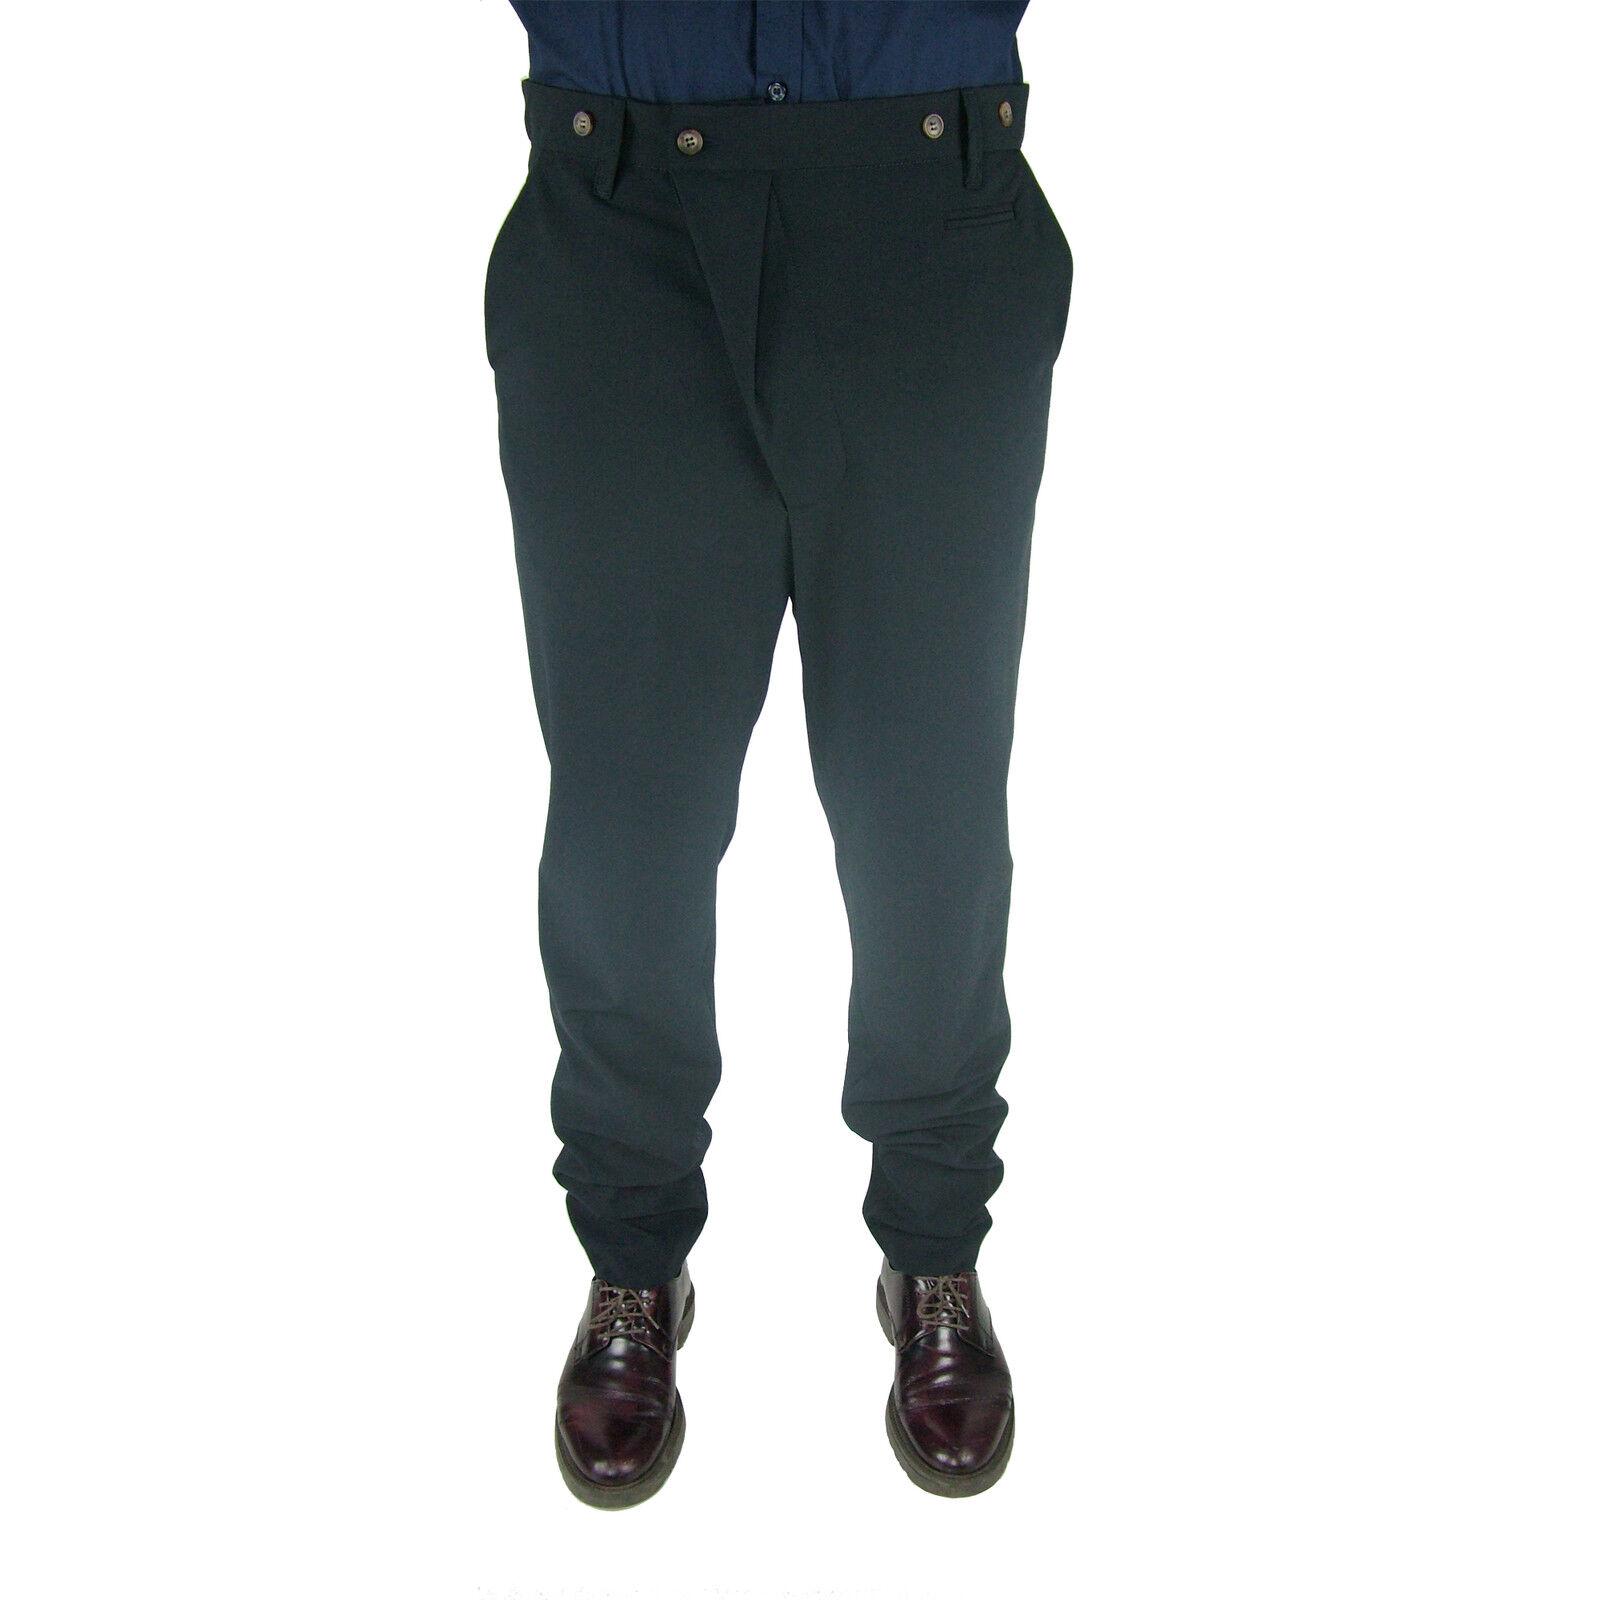 Pantalone Jeans Slim Tuta Turca Capri Cavallo Basso men I'M BRIAN blue Estivo